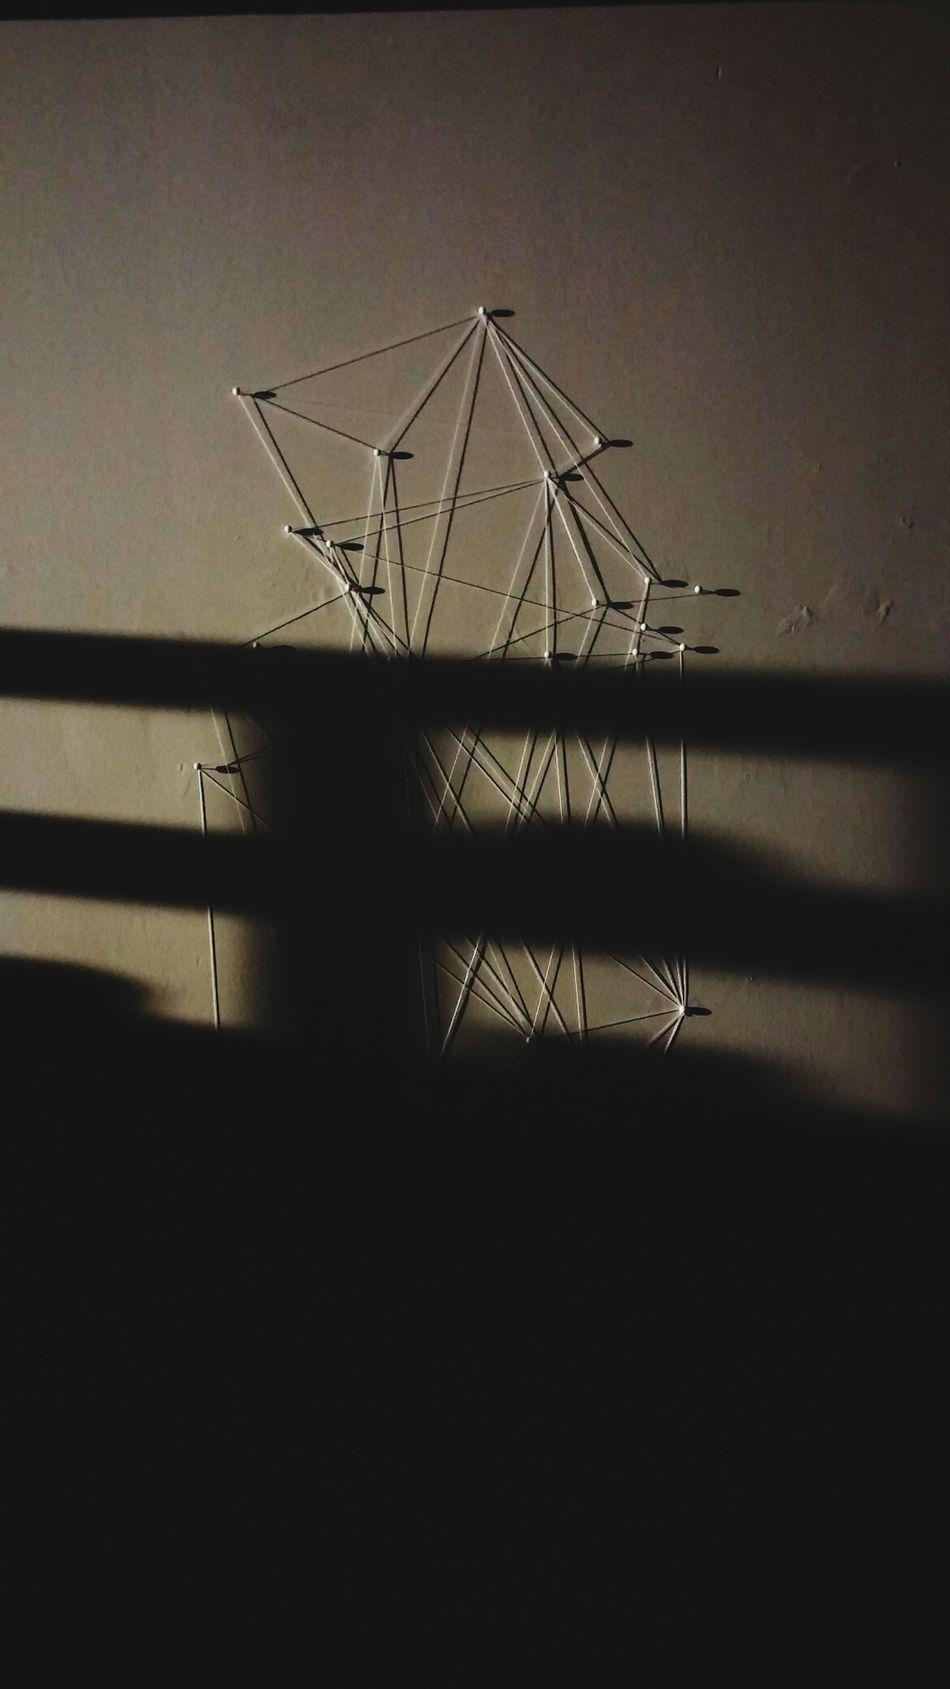 Art Photography Dark Strings Concert Latenight Music Artistic Band Thumb Tacks